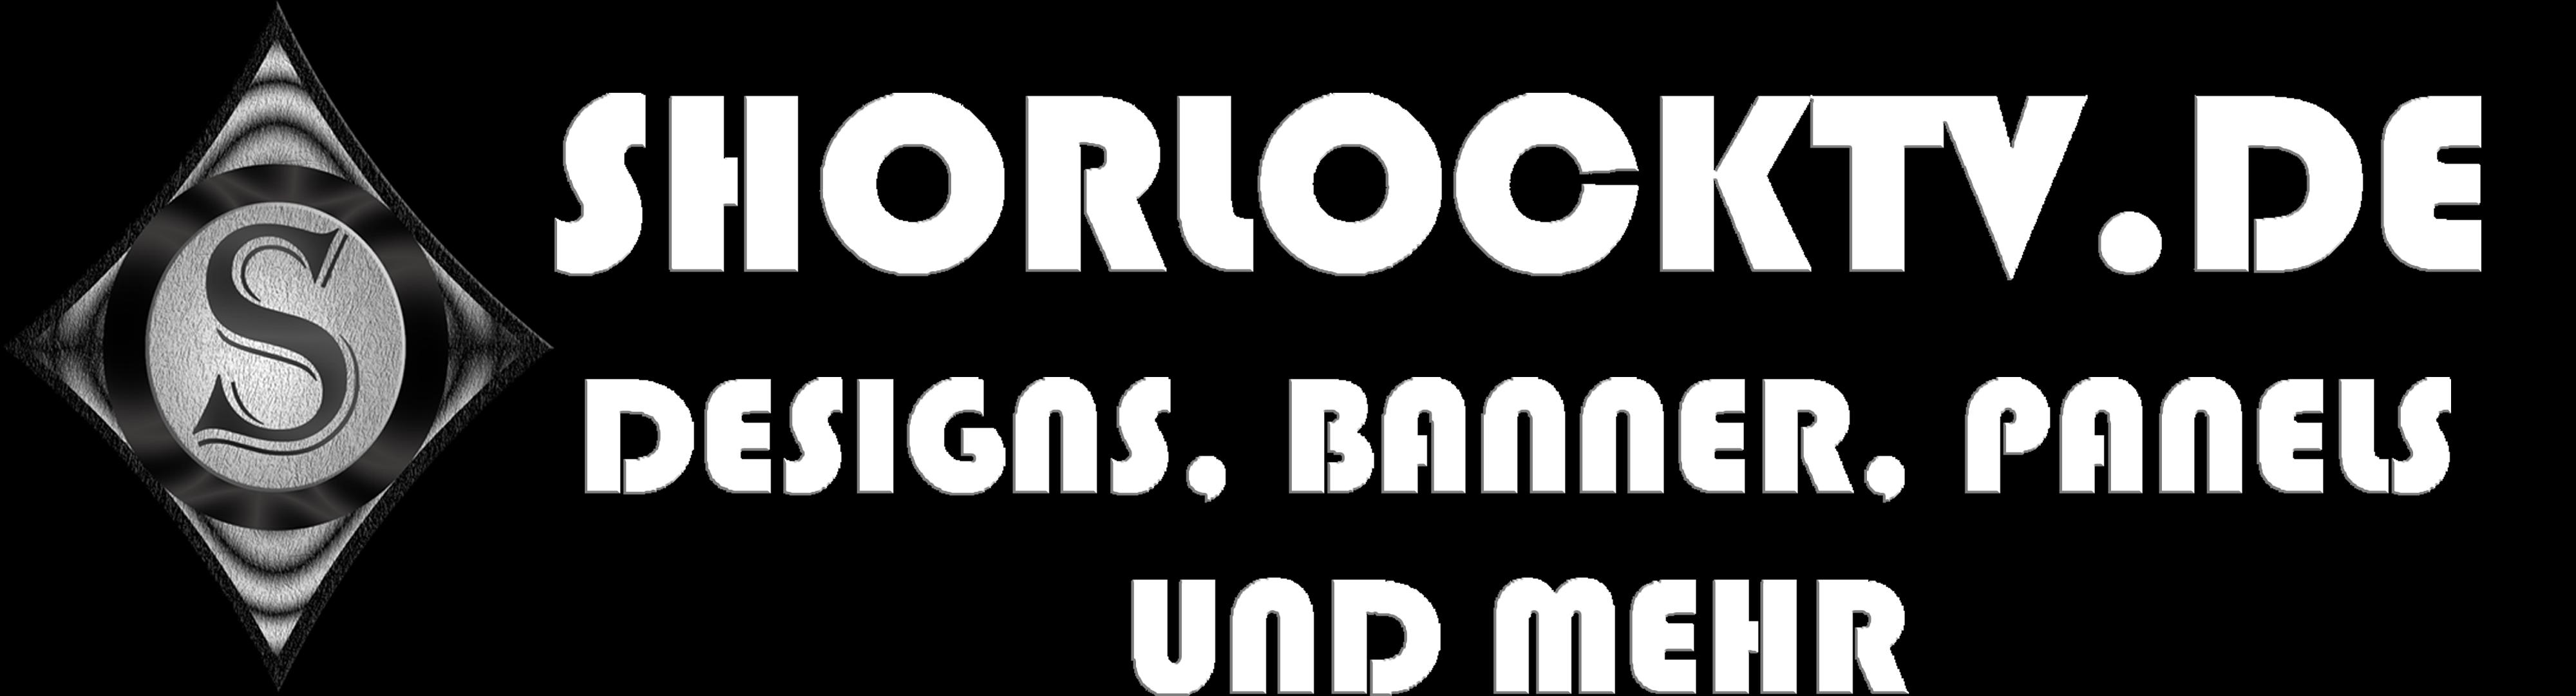 shorlocktv.de